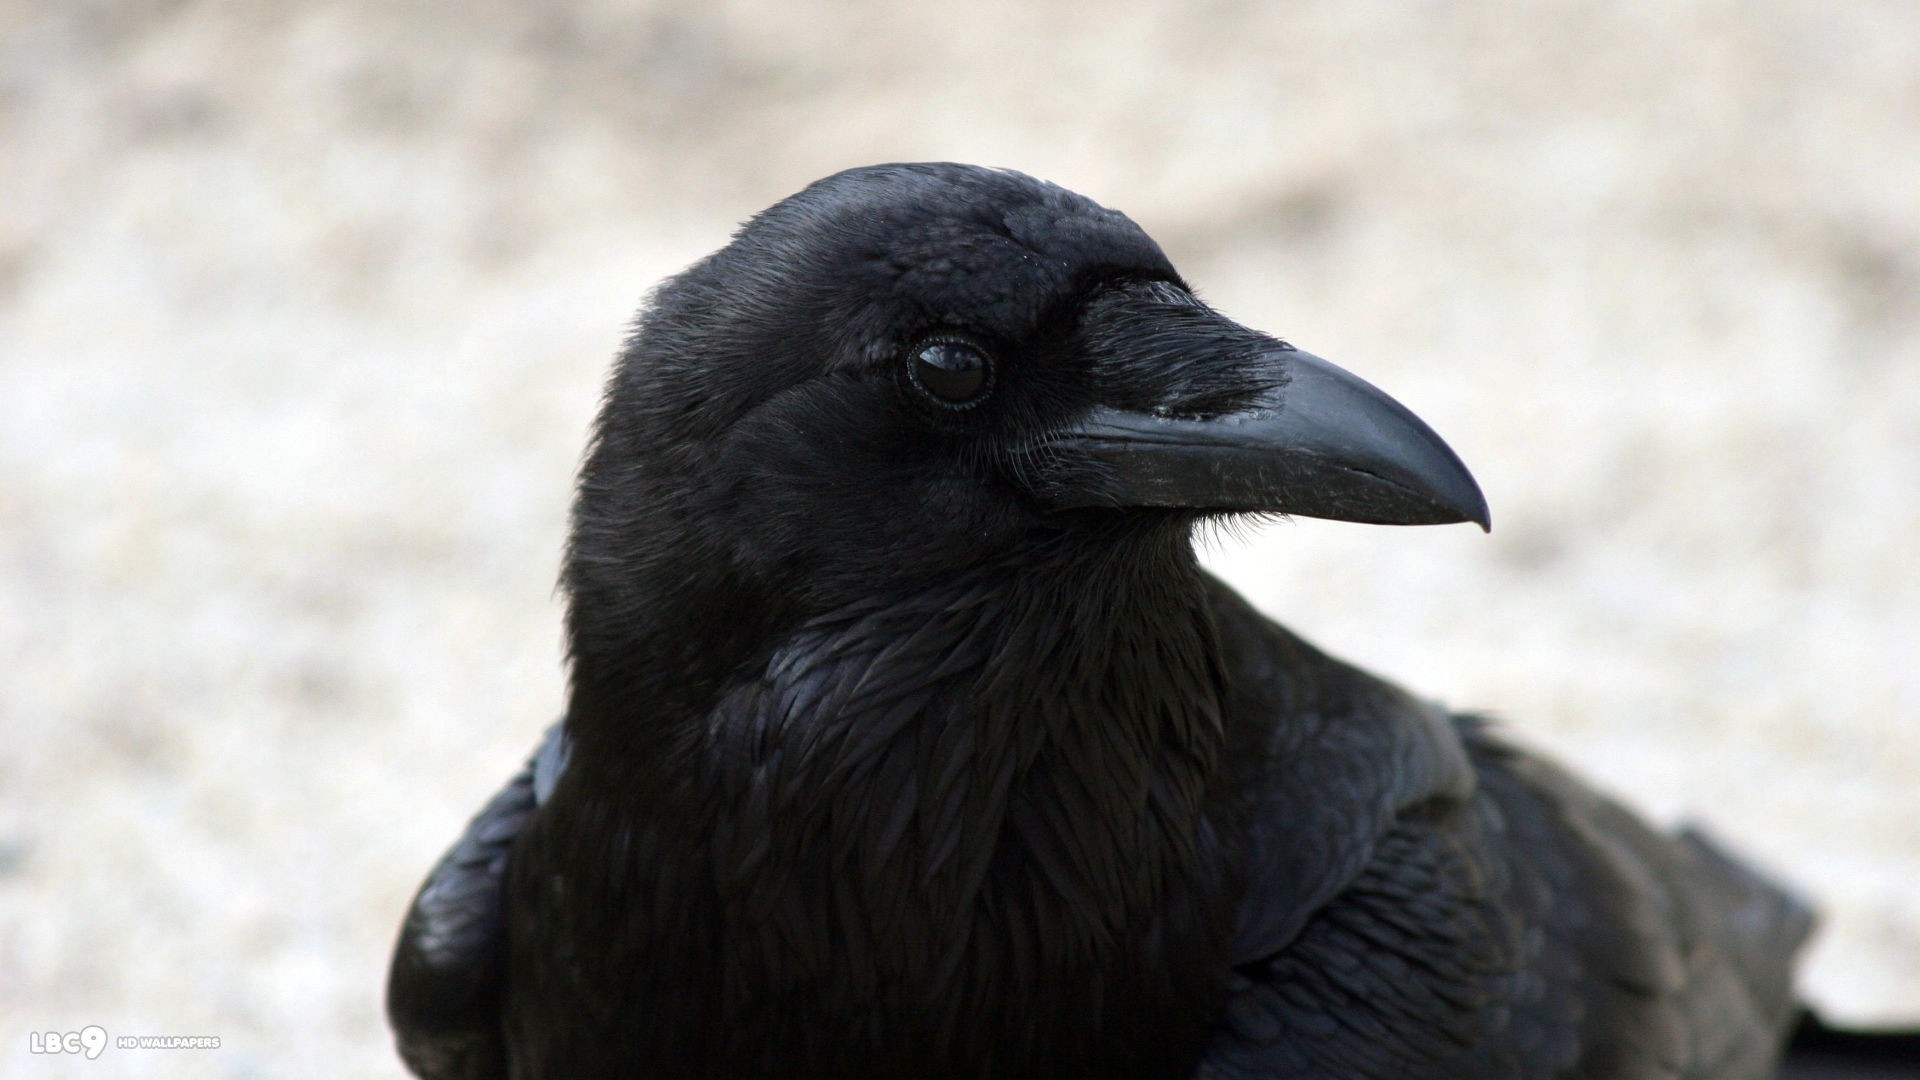 Raven Full HD Wallpaper